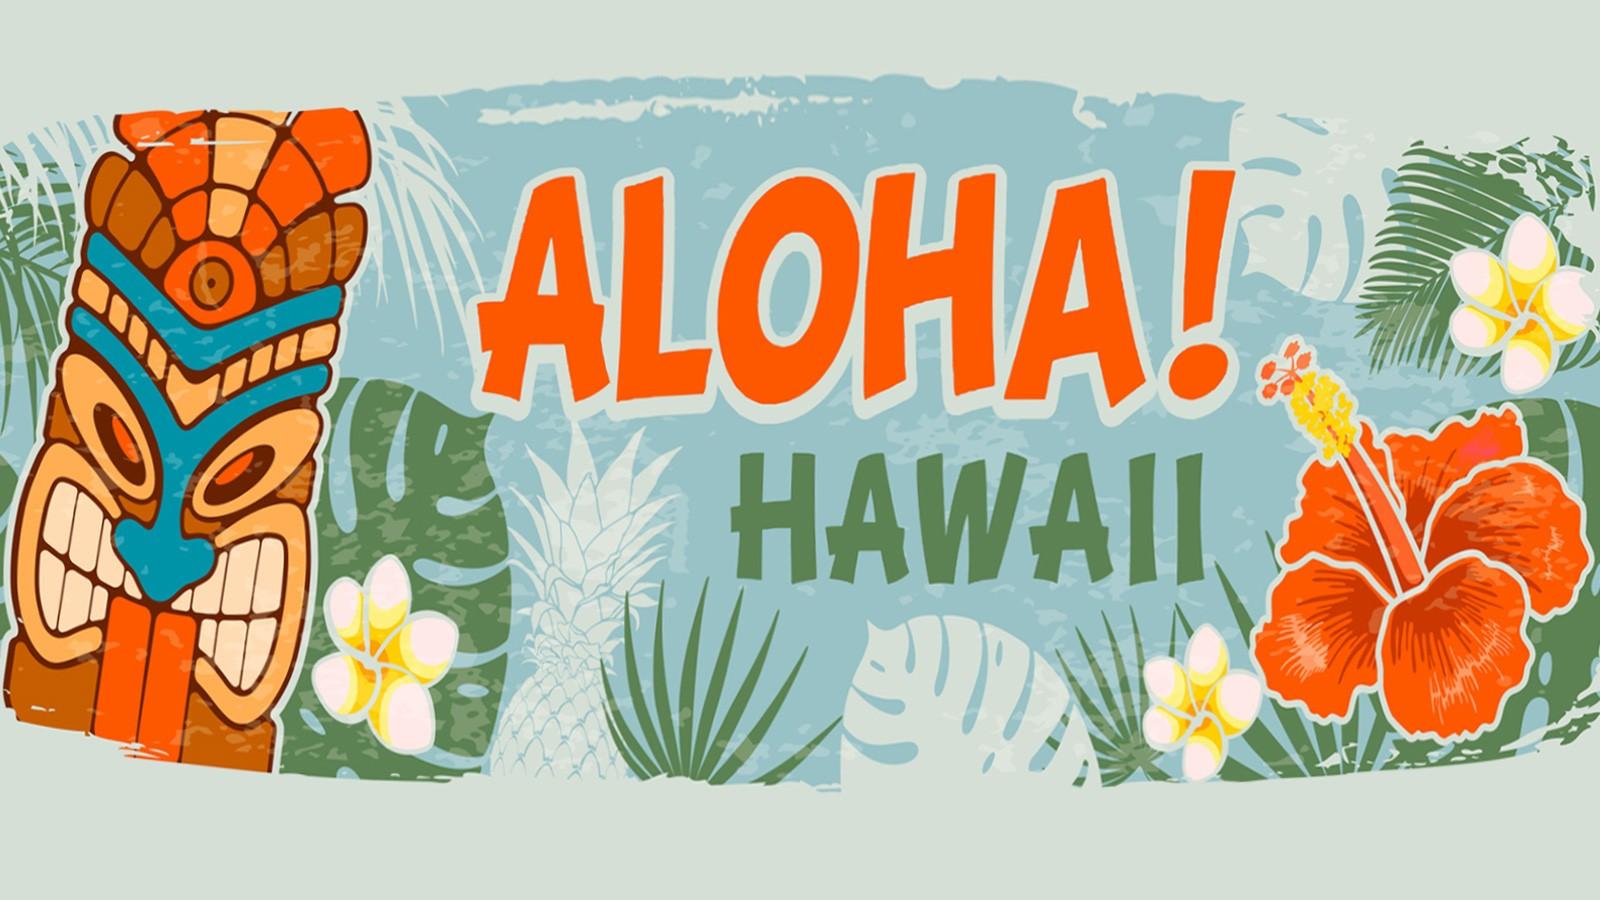 hawaiian language aloha